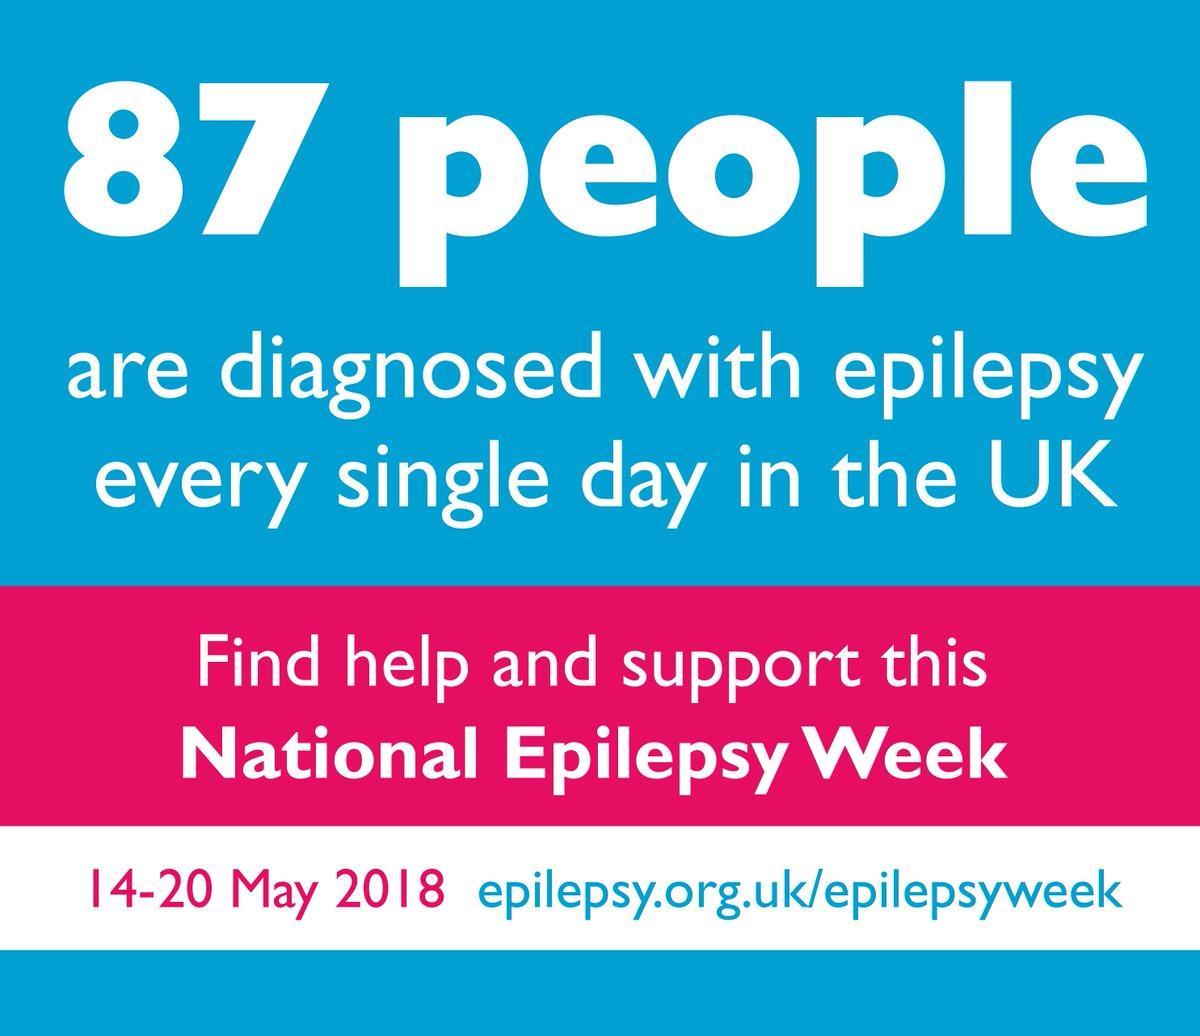 Today is the first day of National #EpilepsyWeek https://t.co/iplyxF6Jjd #epilepsy